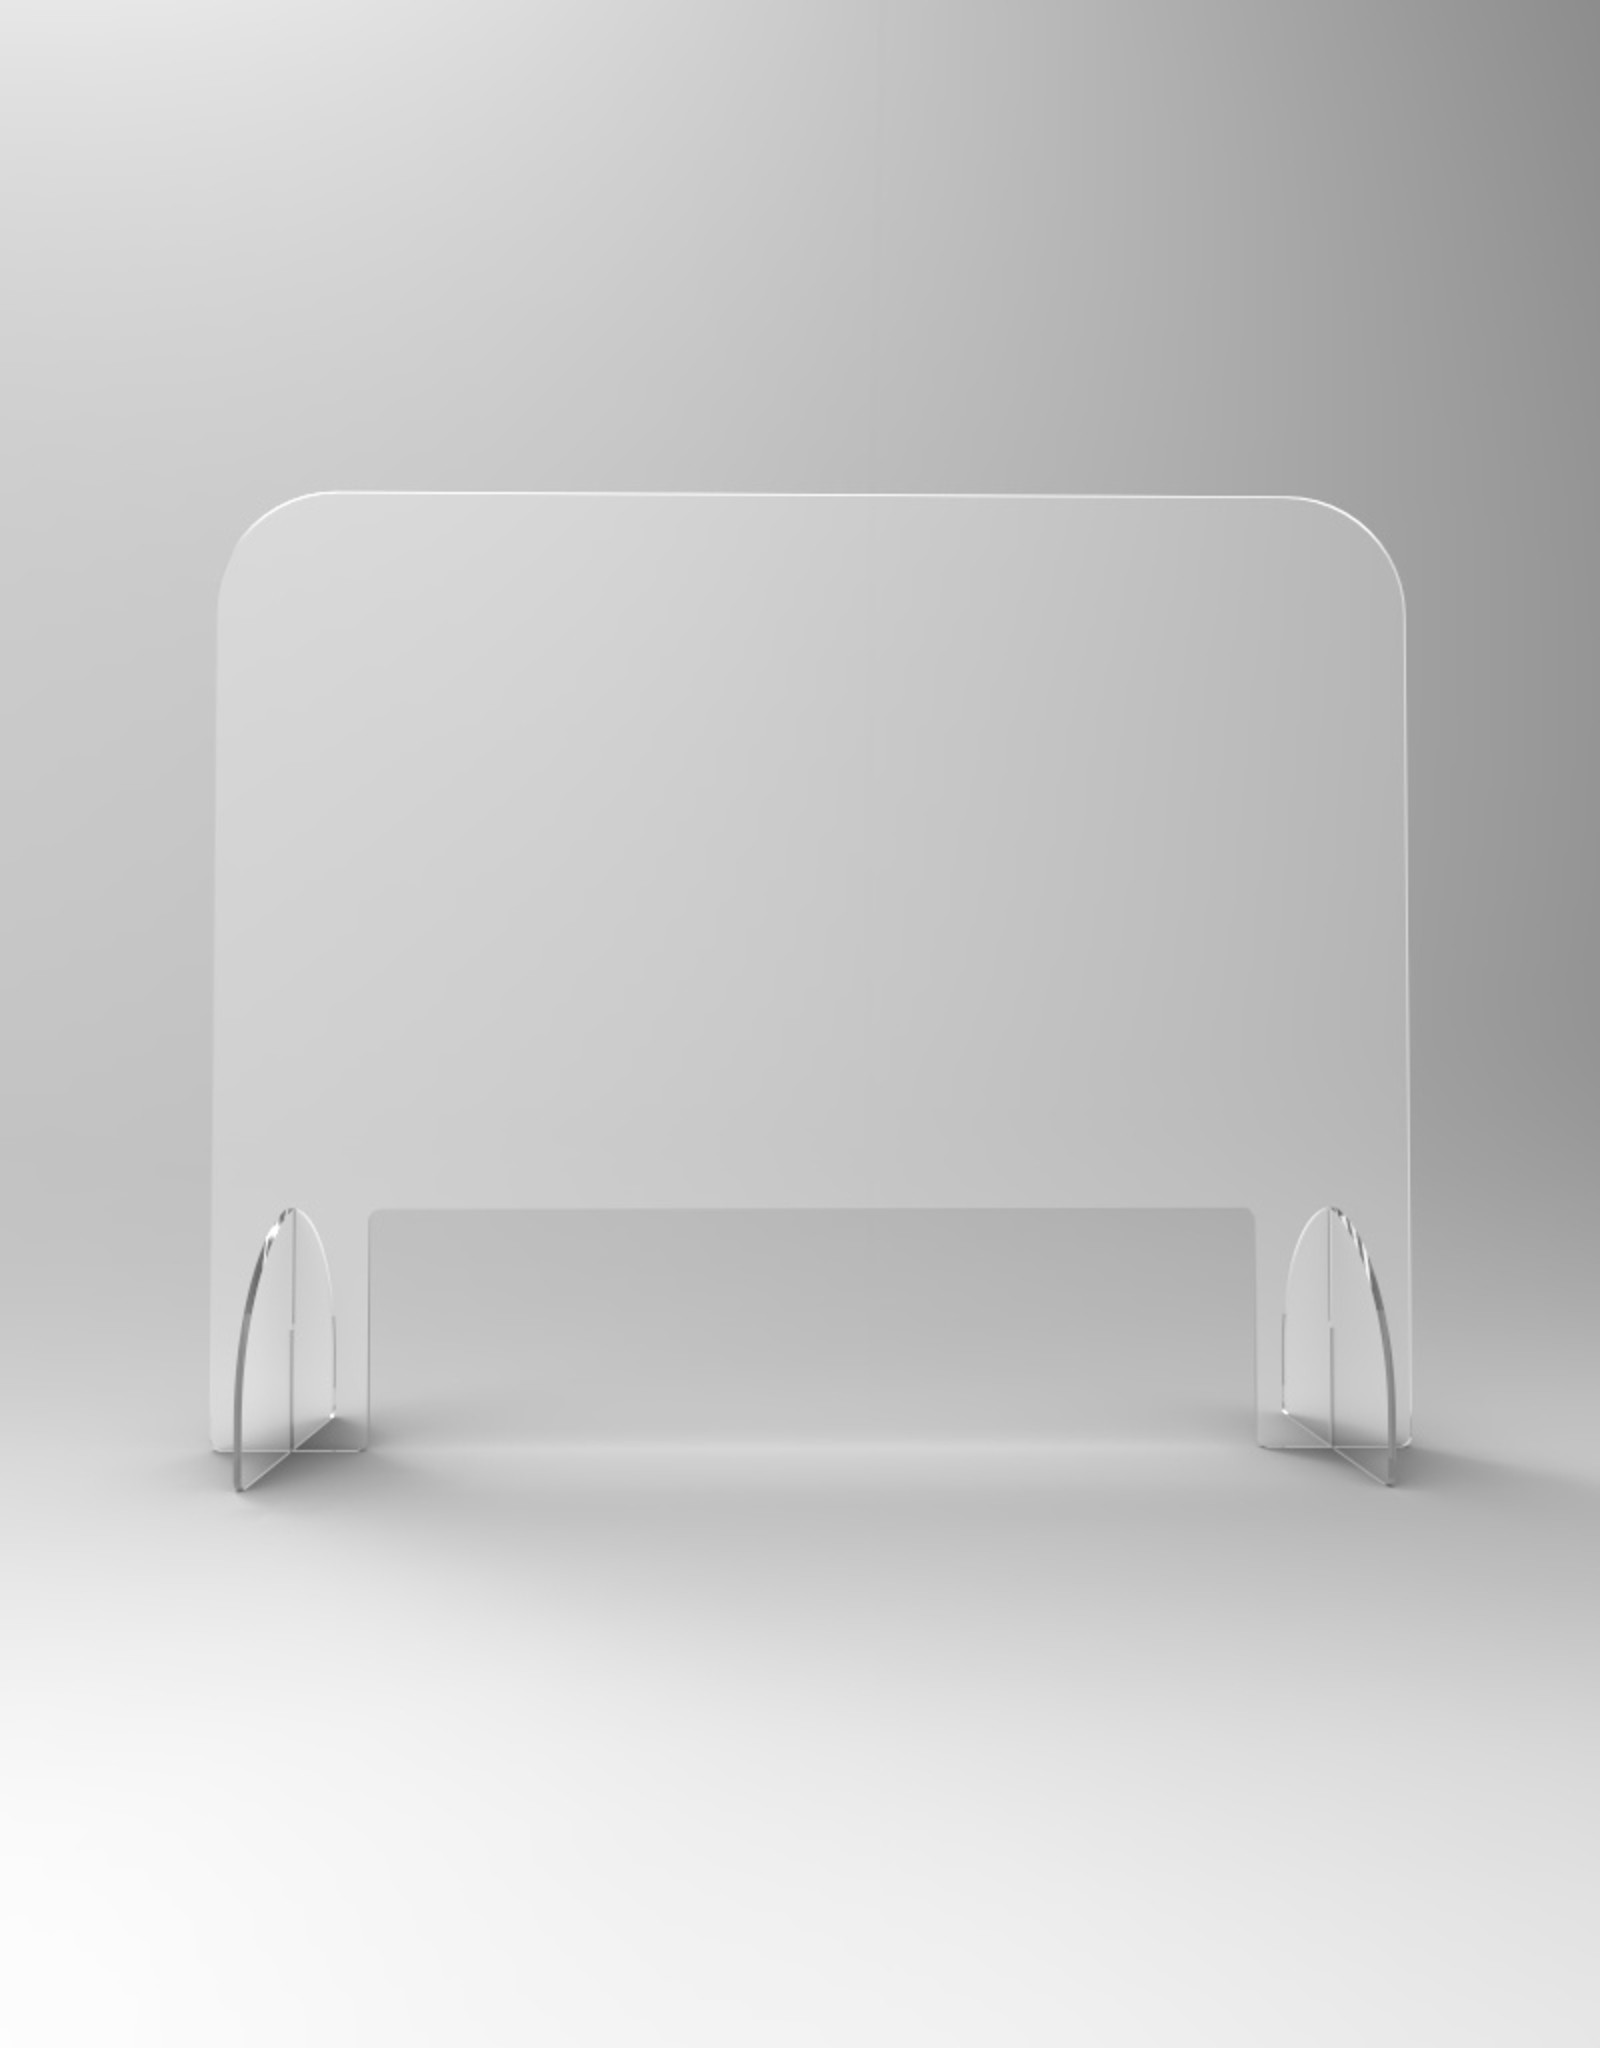 SaveScreen baliescherm glashelder 100x80cm met brede opening